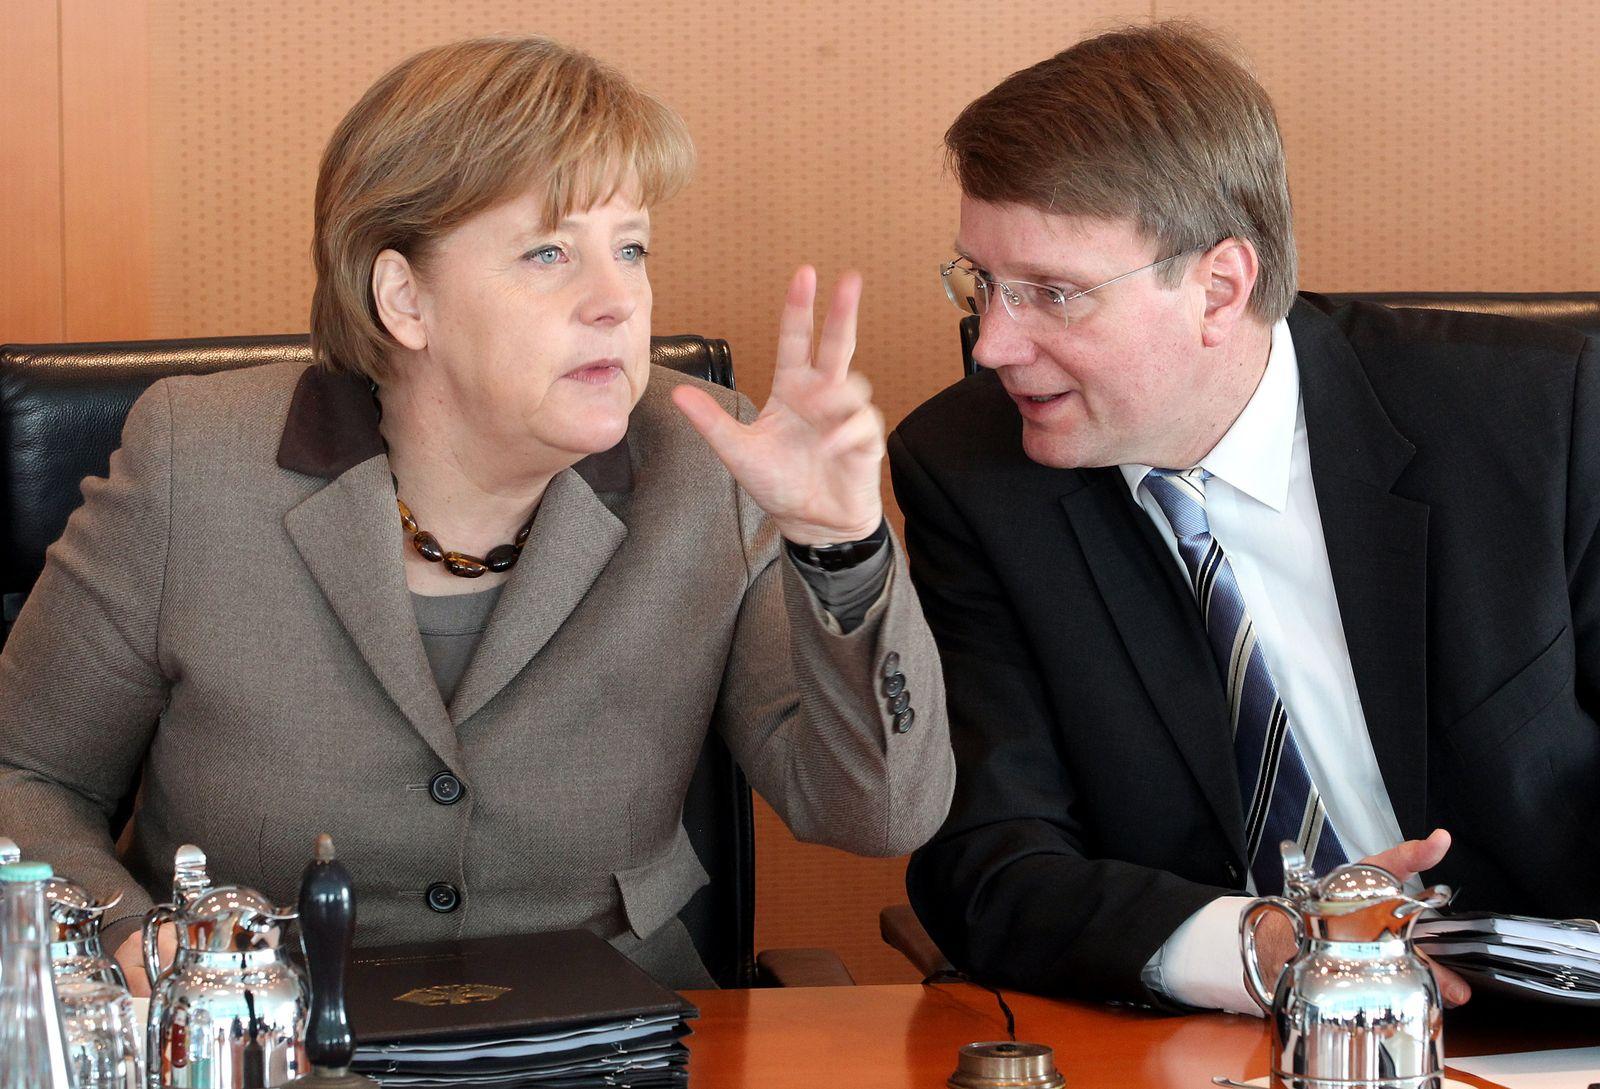 Kabinett - Merkel und Pofalla